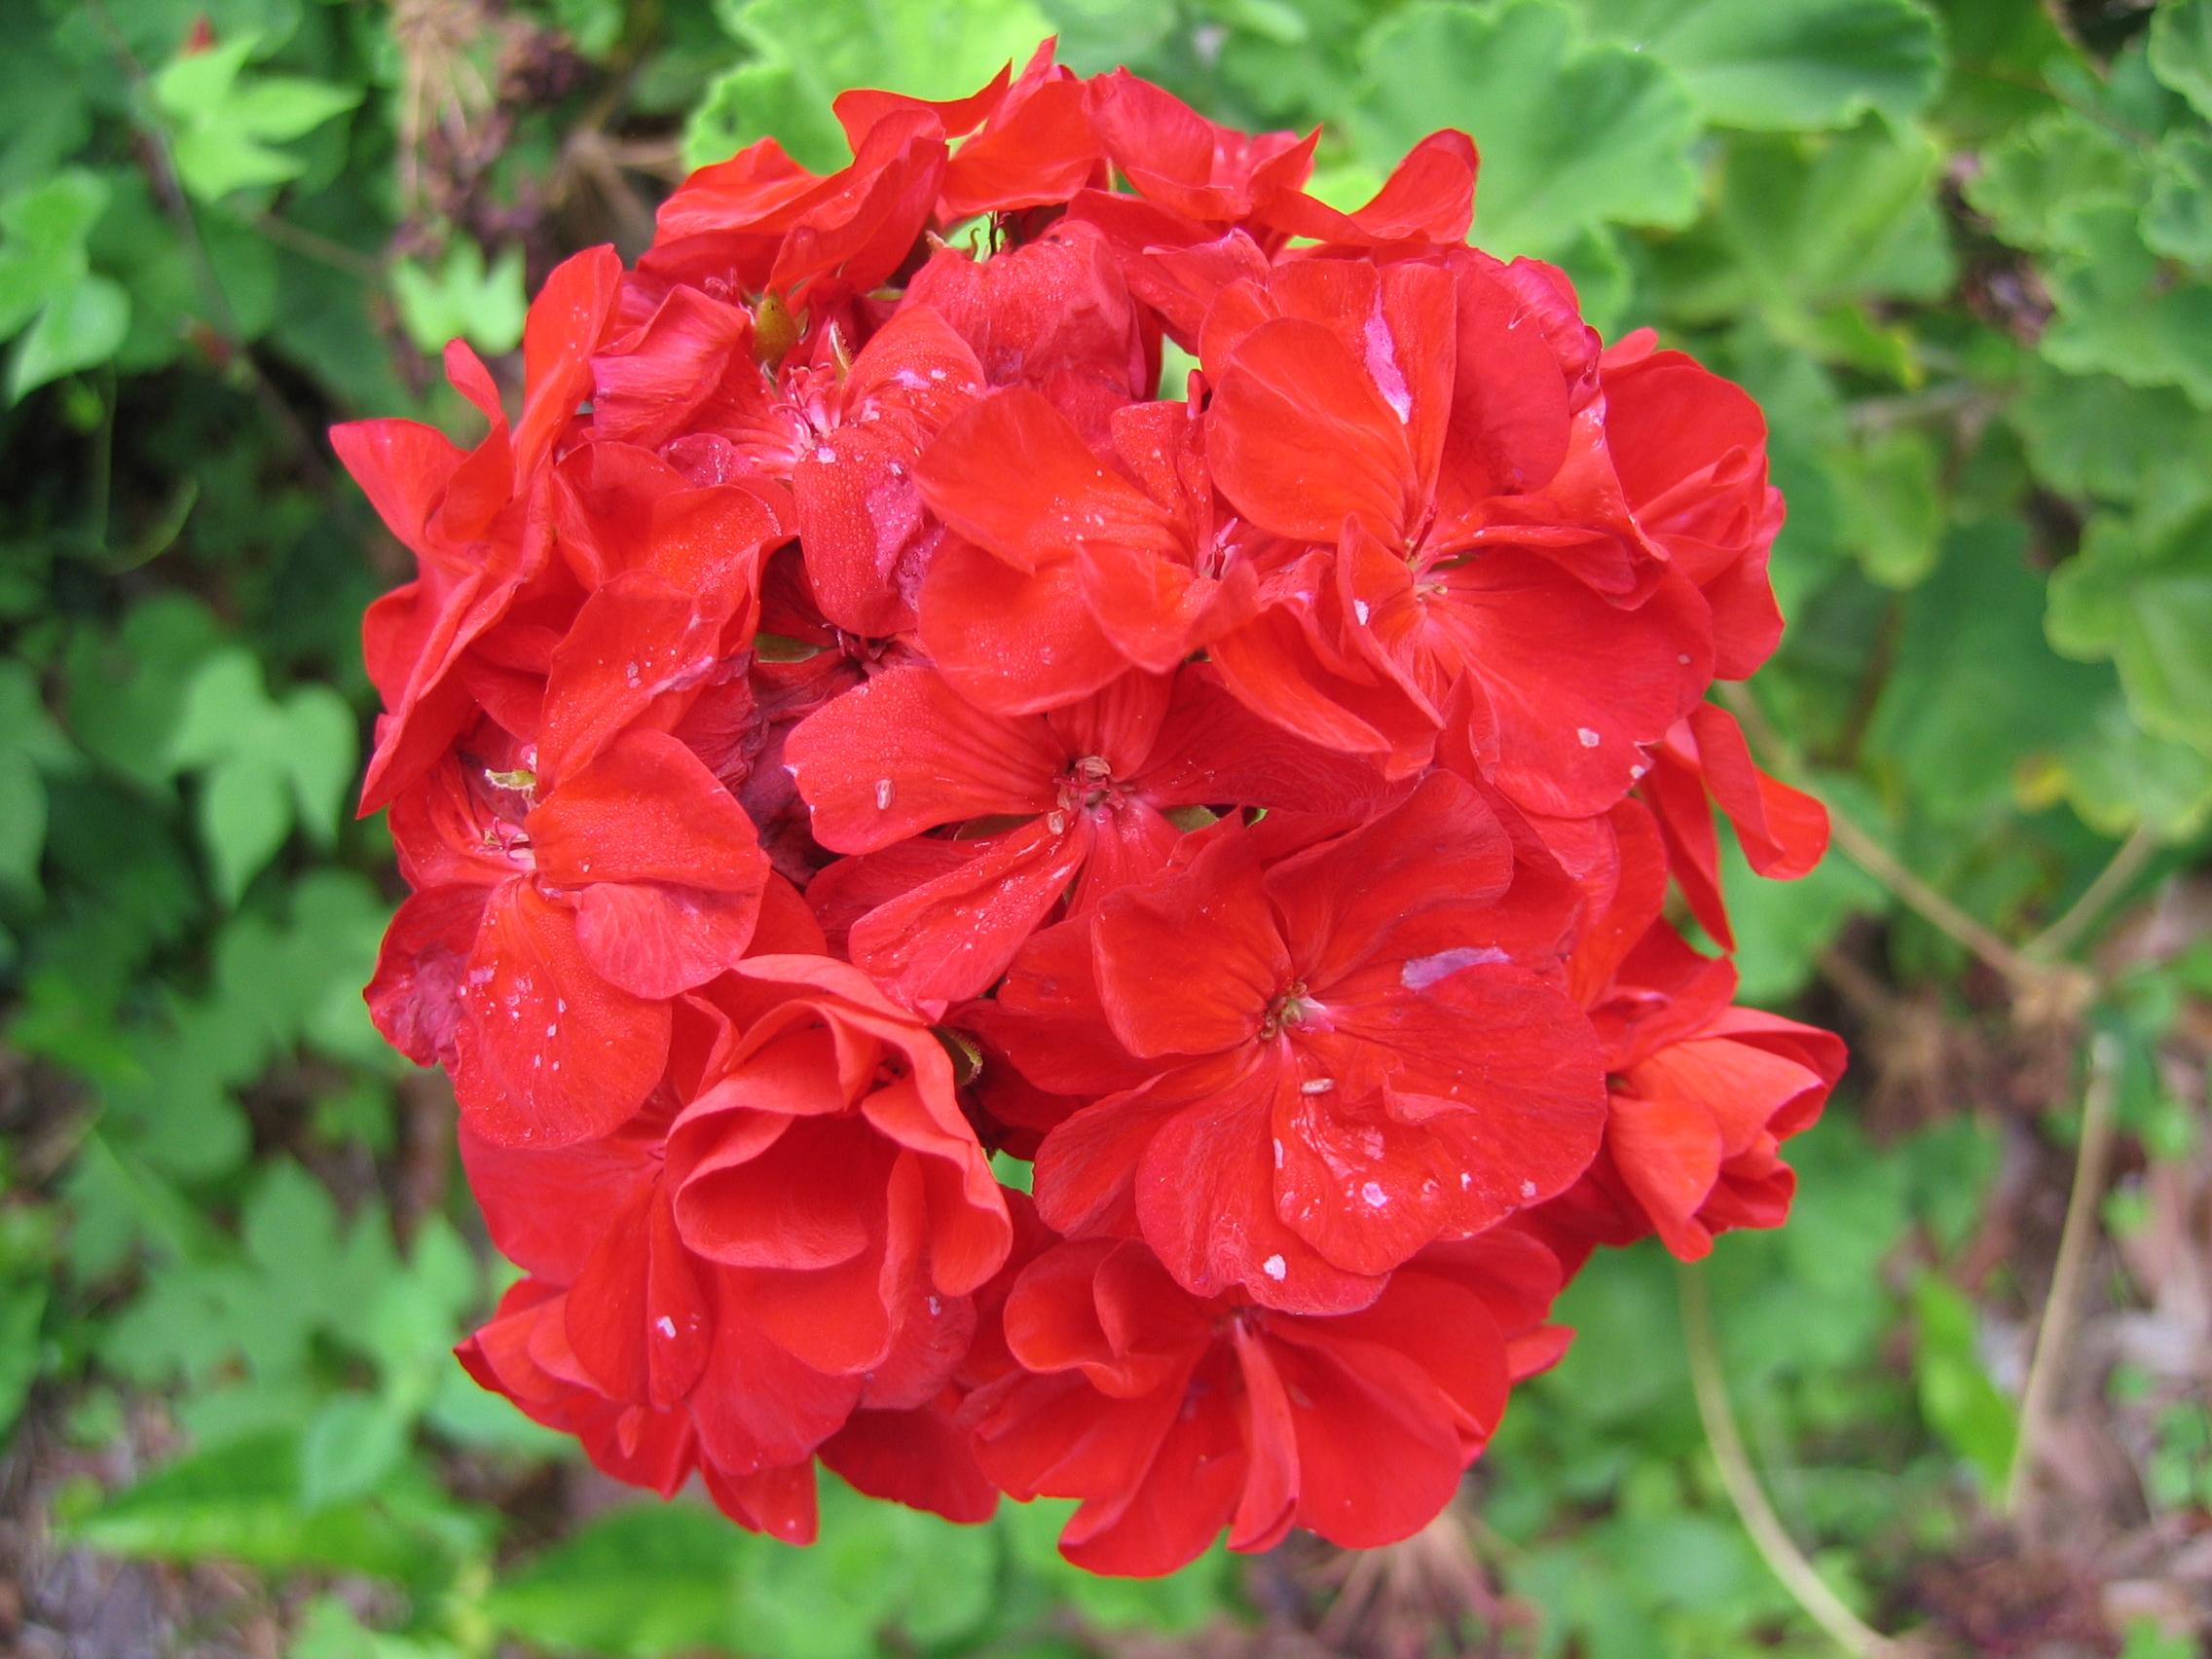 File:Unidentified Red Flowers.JPG - Wikimedia Commons